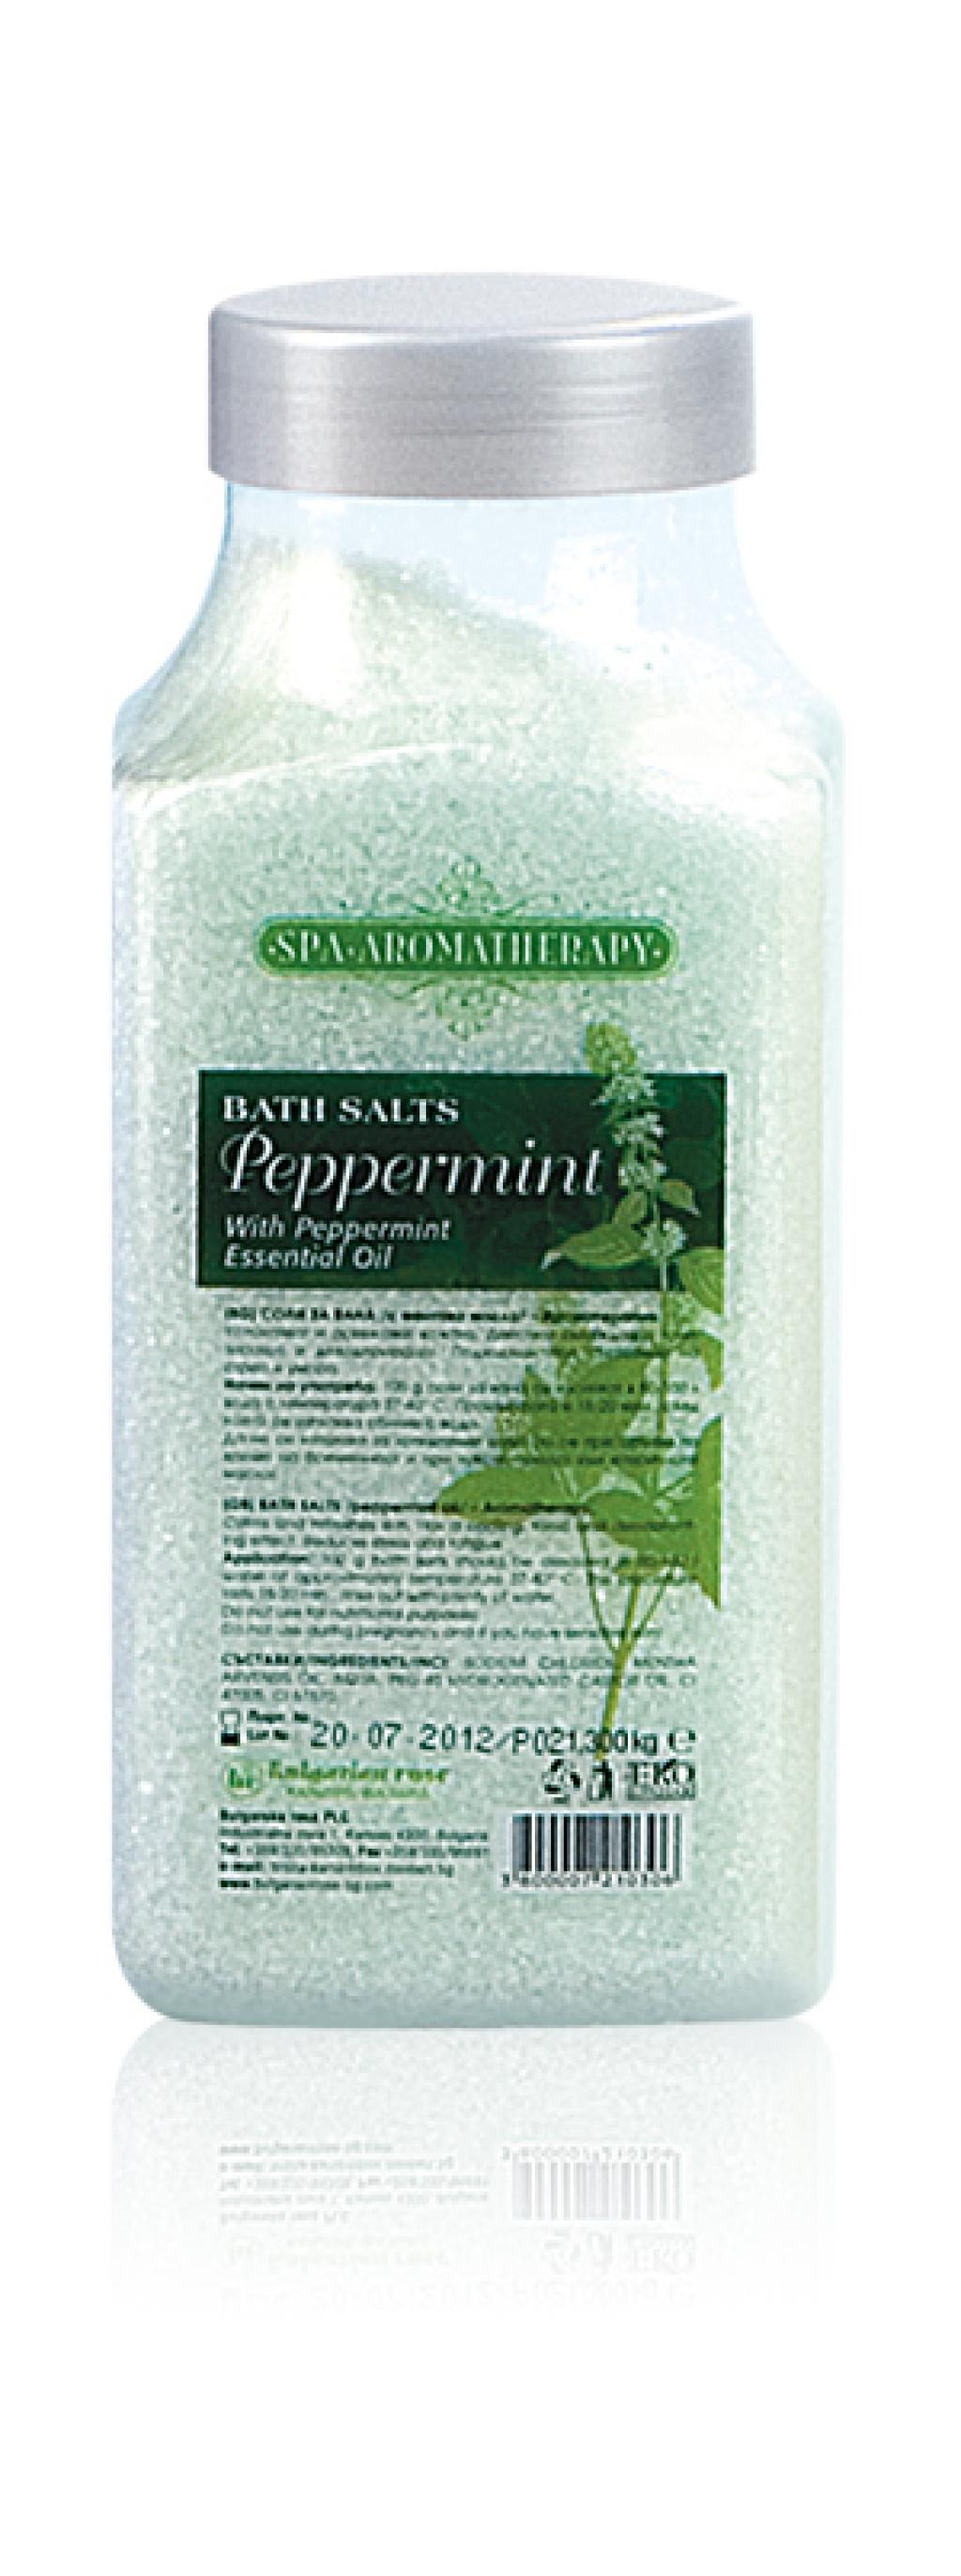 Bulgarian Bath Salts Peppermint - 440 g